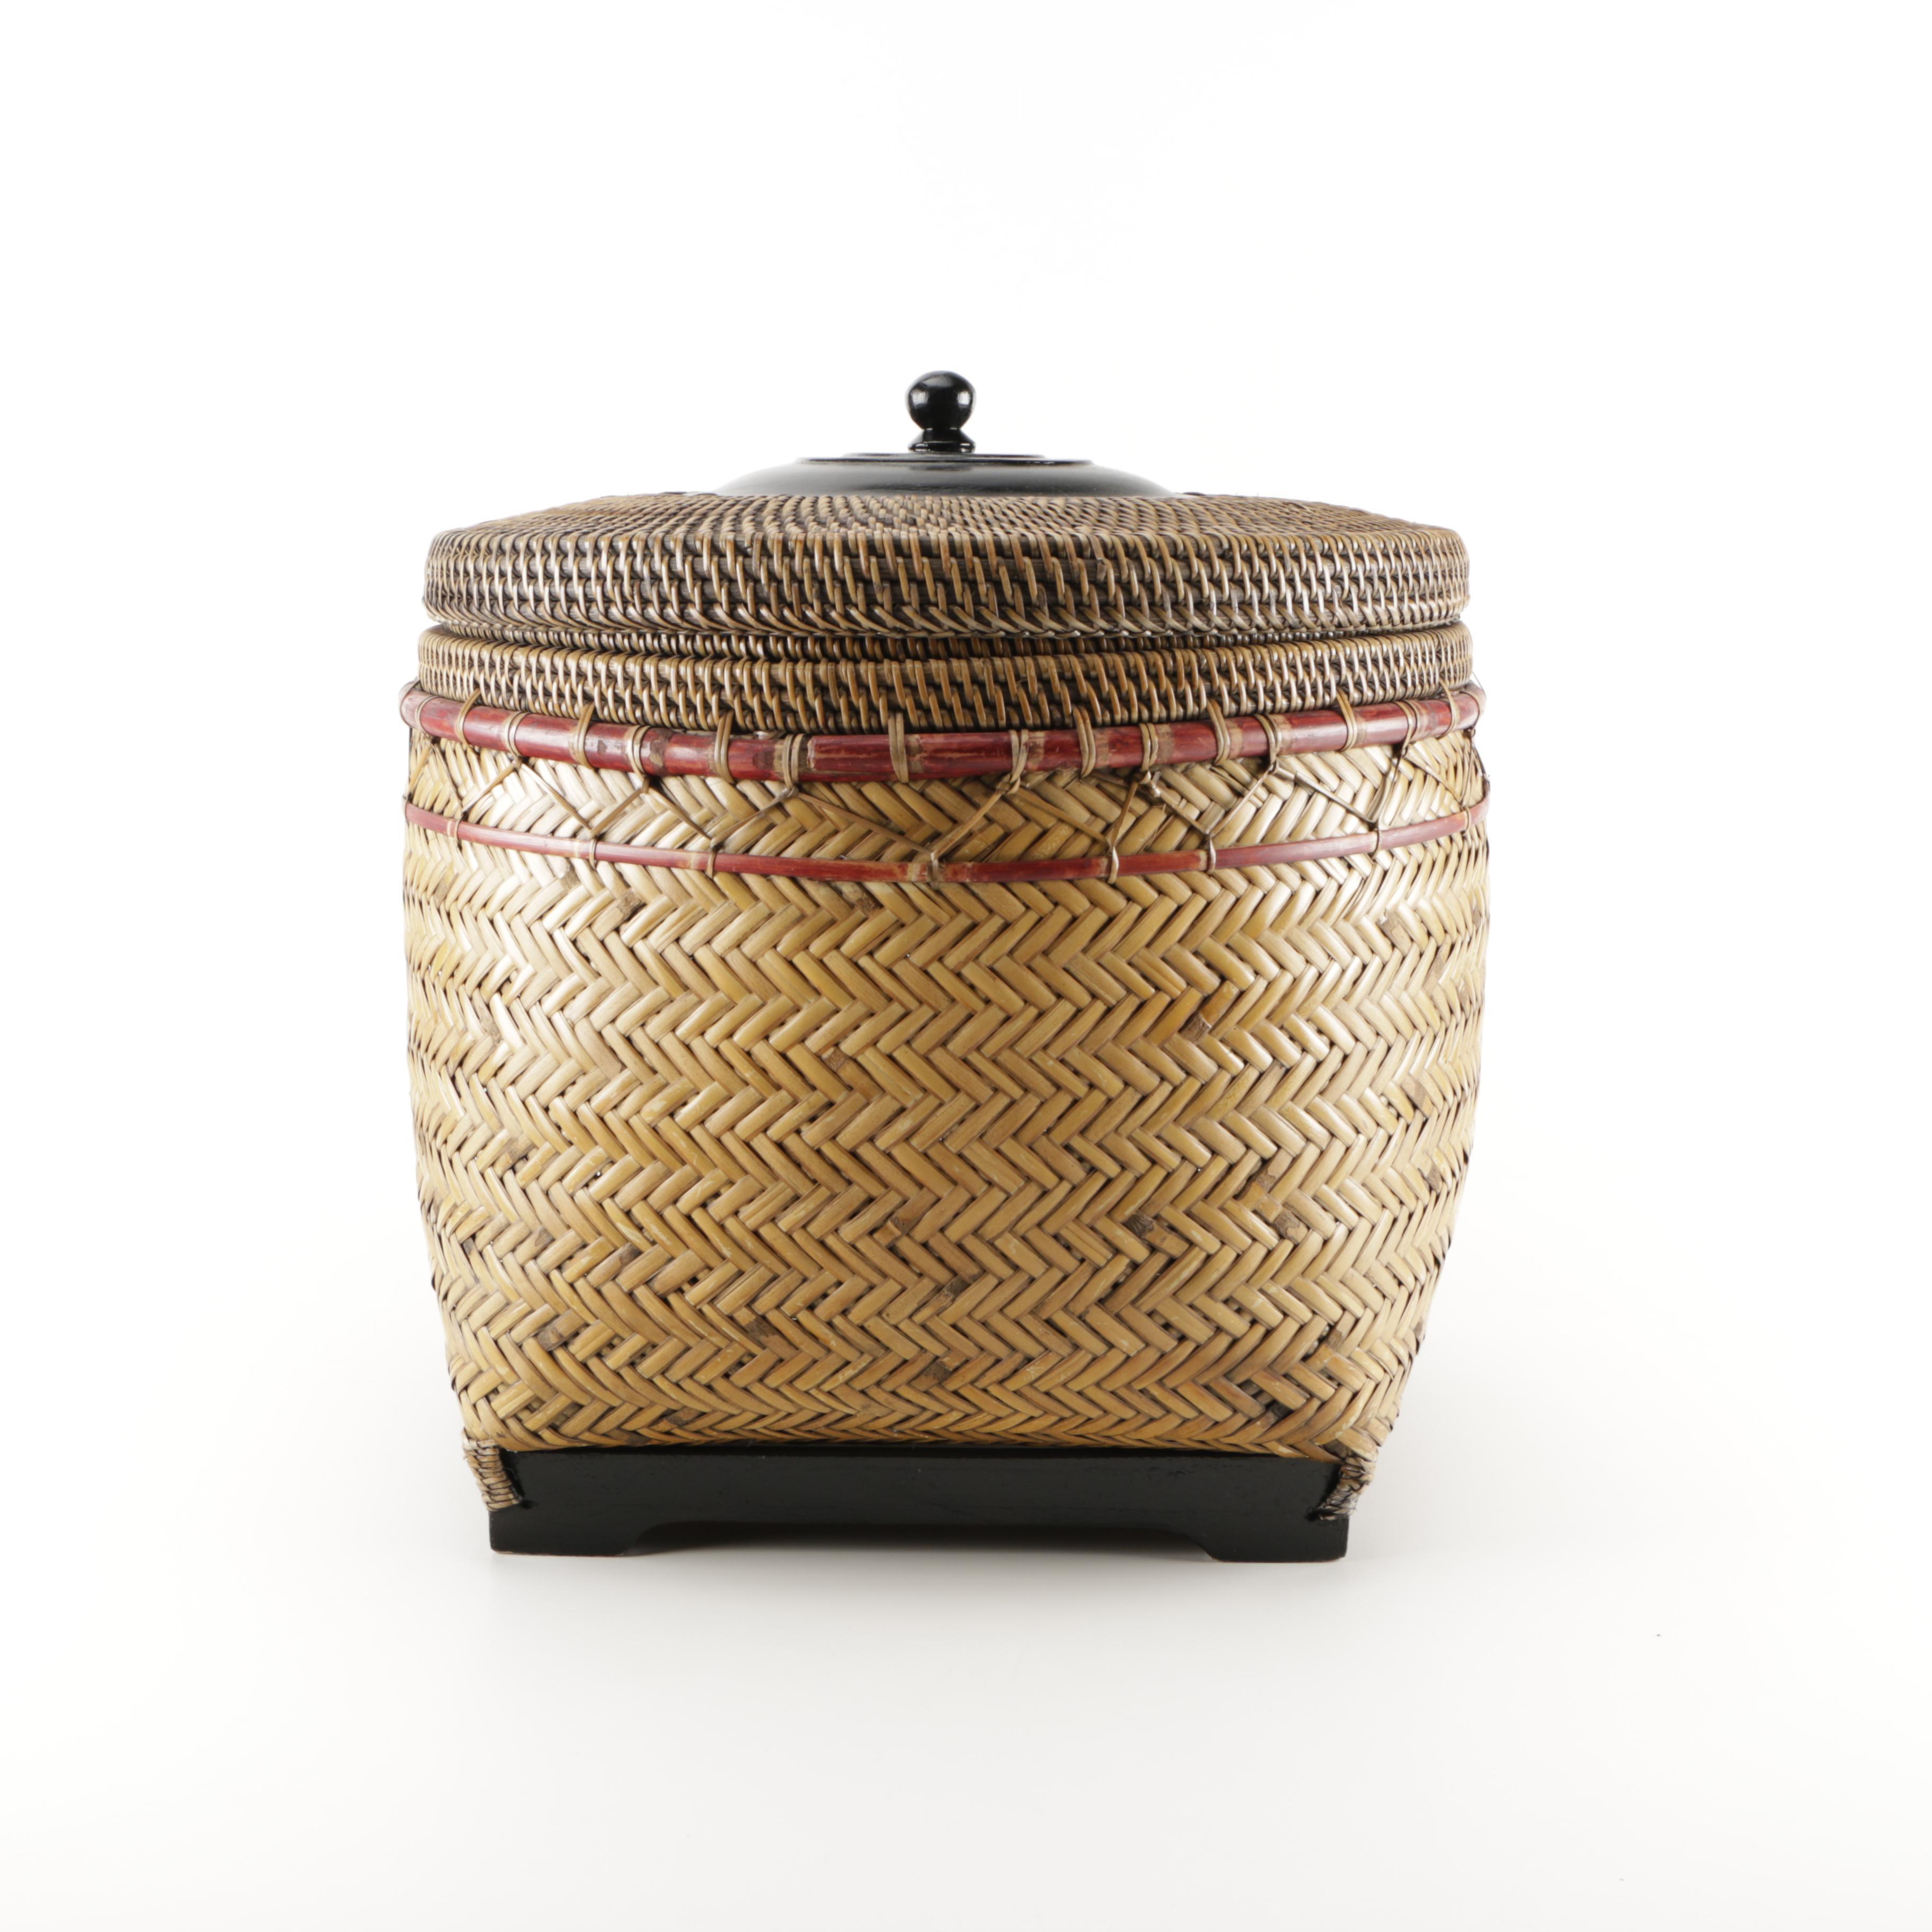 "Crate & Barrel ""Rinjani"" Basket With Lid"